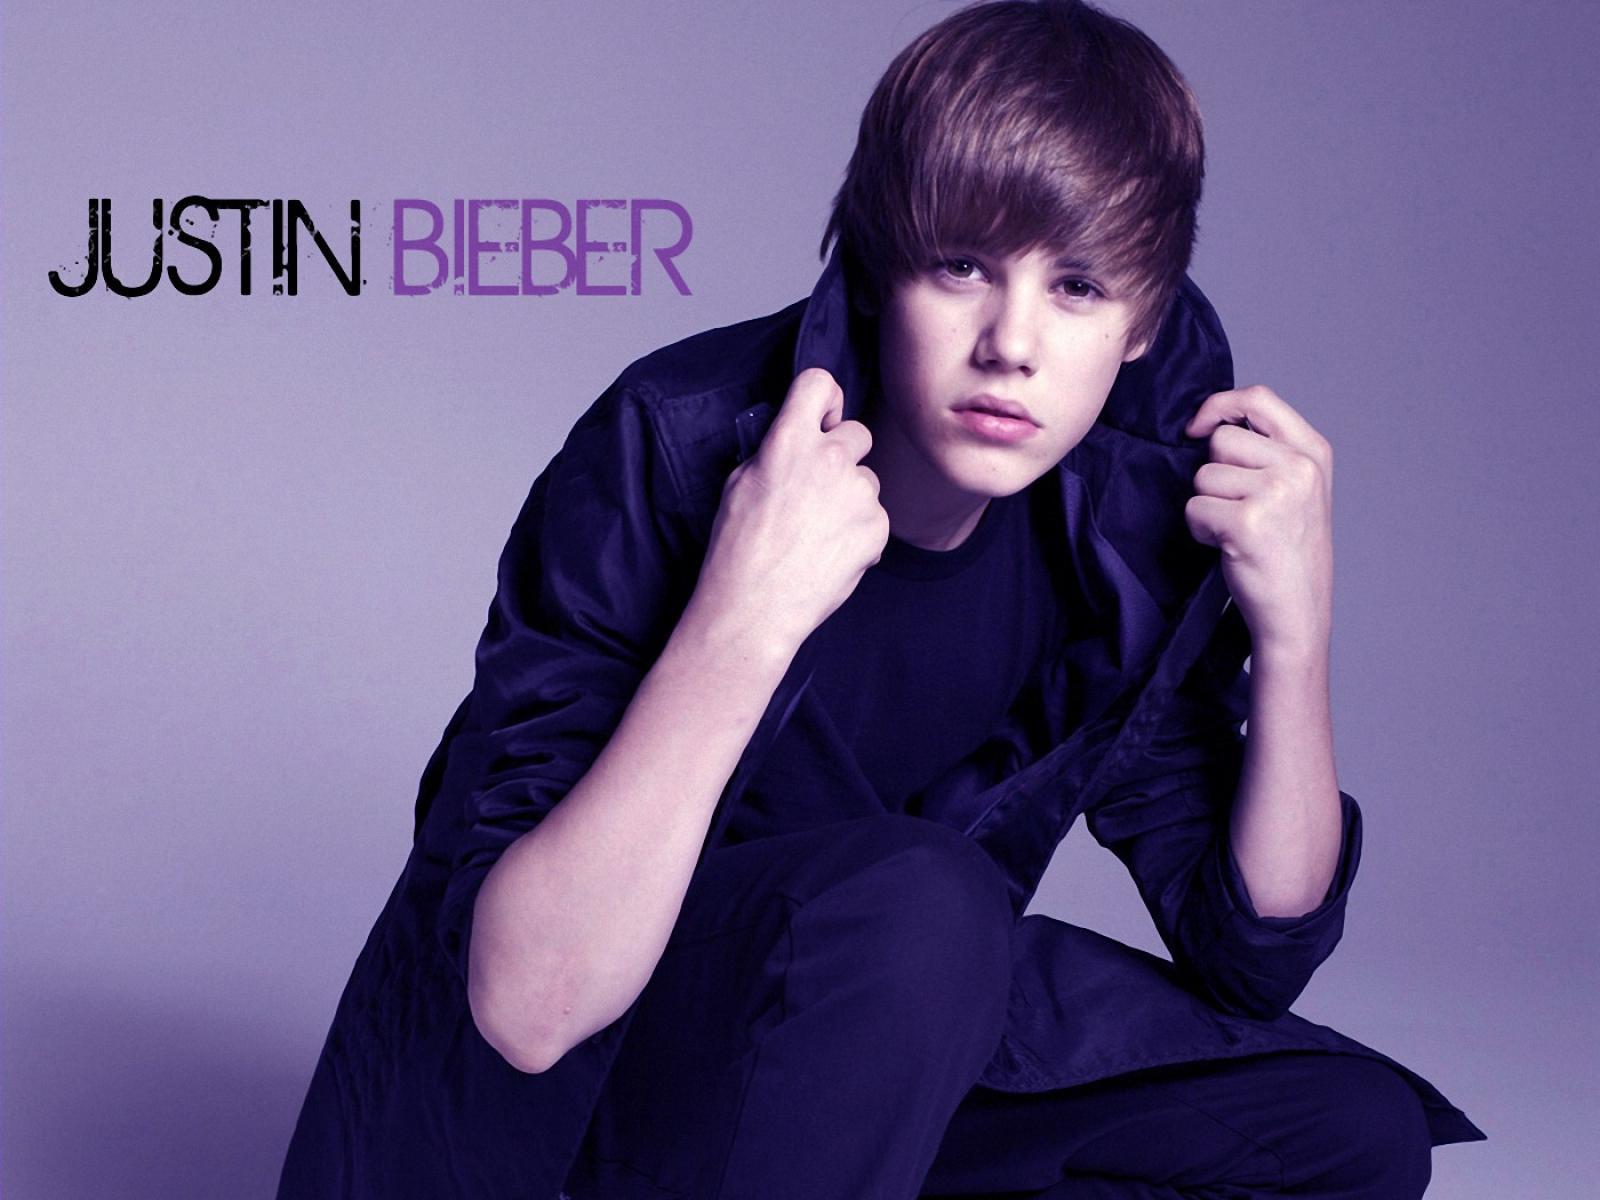 Justin Bieber Wallpapers HD 2015 - Wallpaper Cave